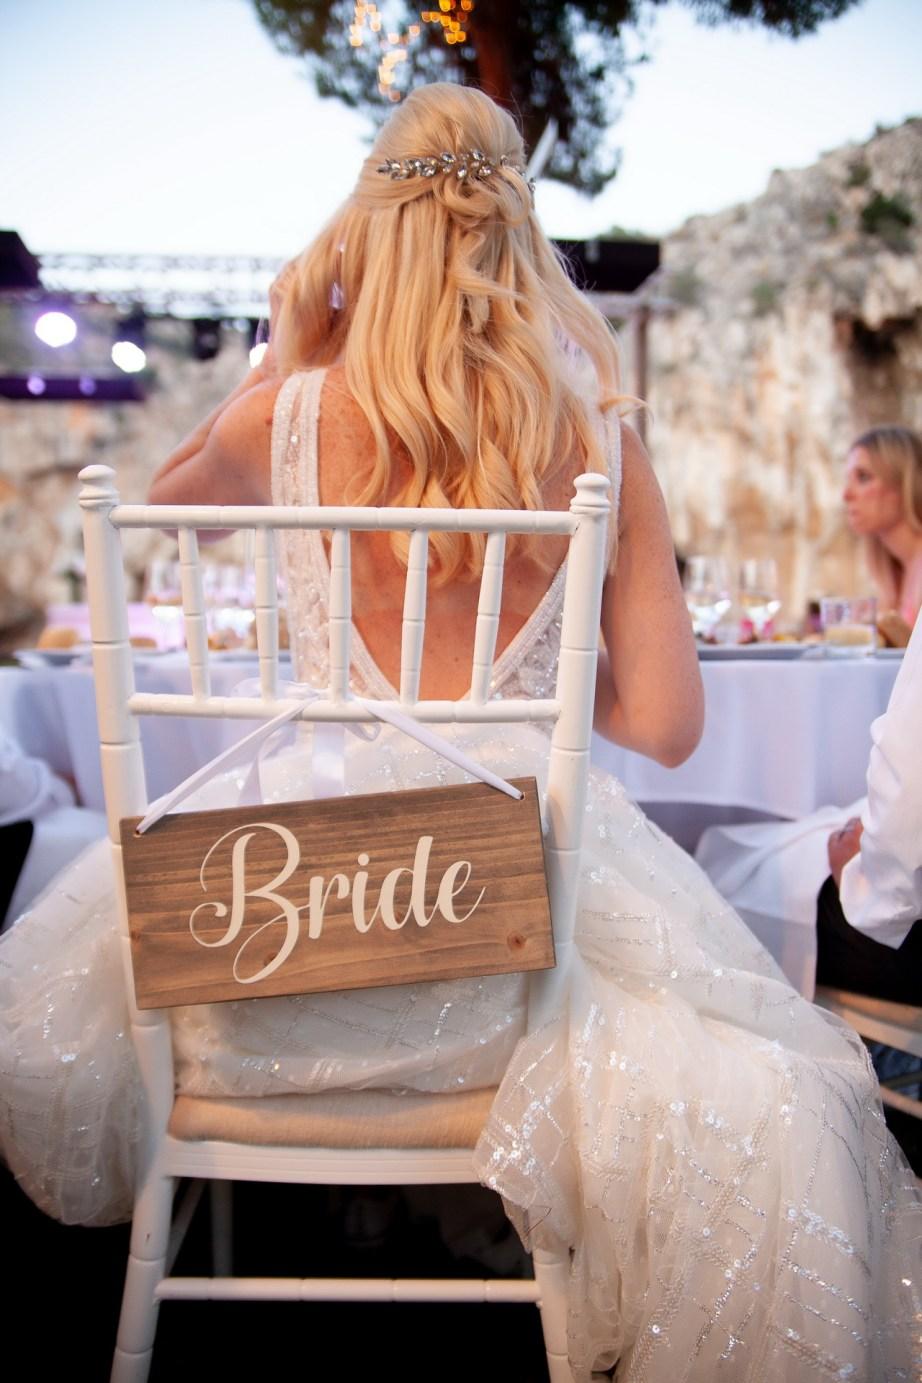 Lake_vouliagmeni_greece_weddings_nicole_caldwell_91